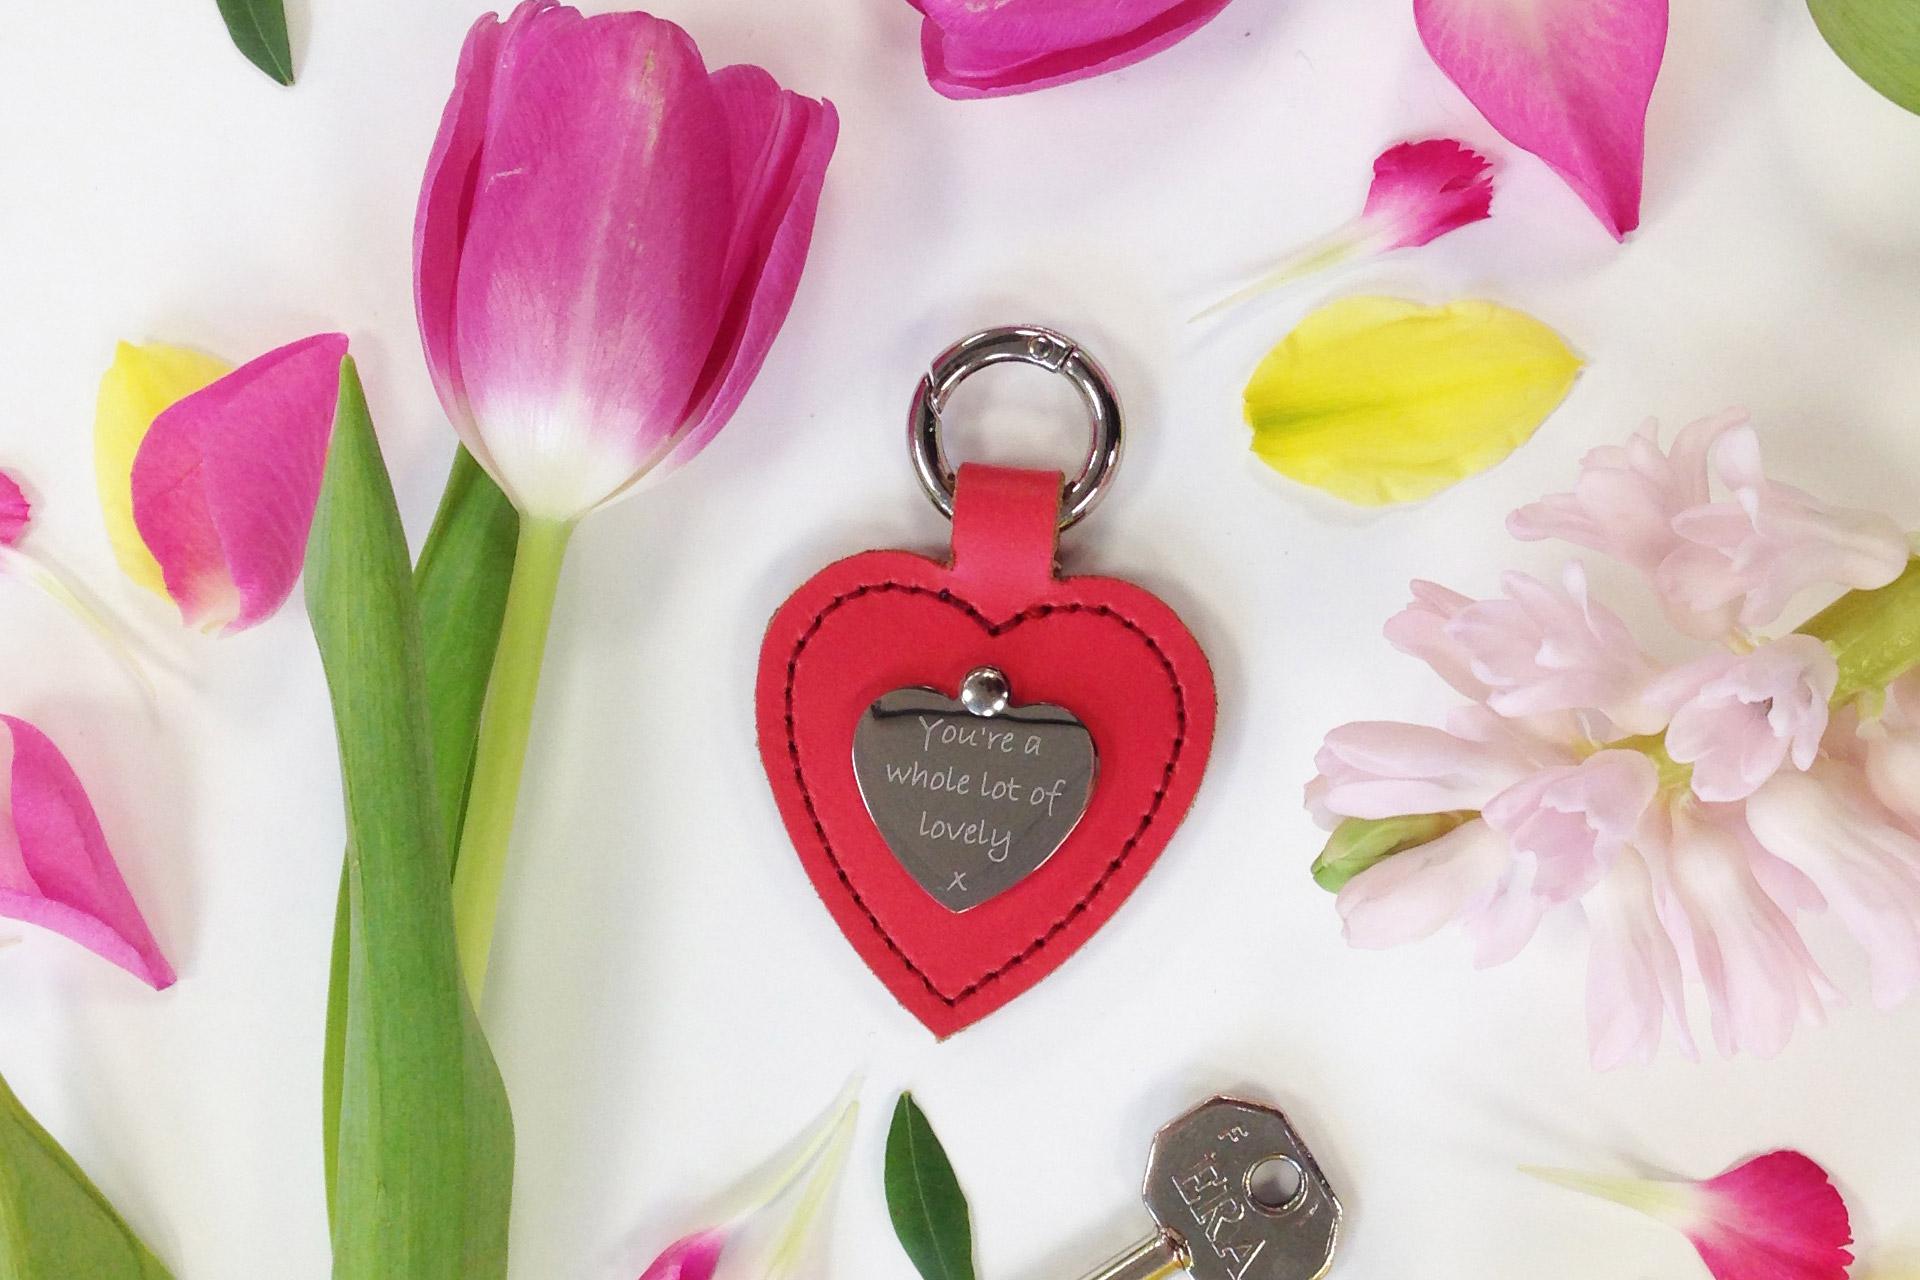 PERSONALISED HEART KEYRING £20.00